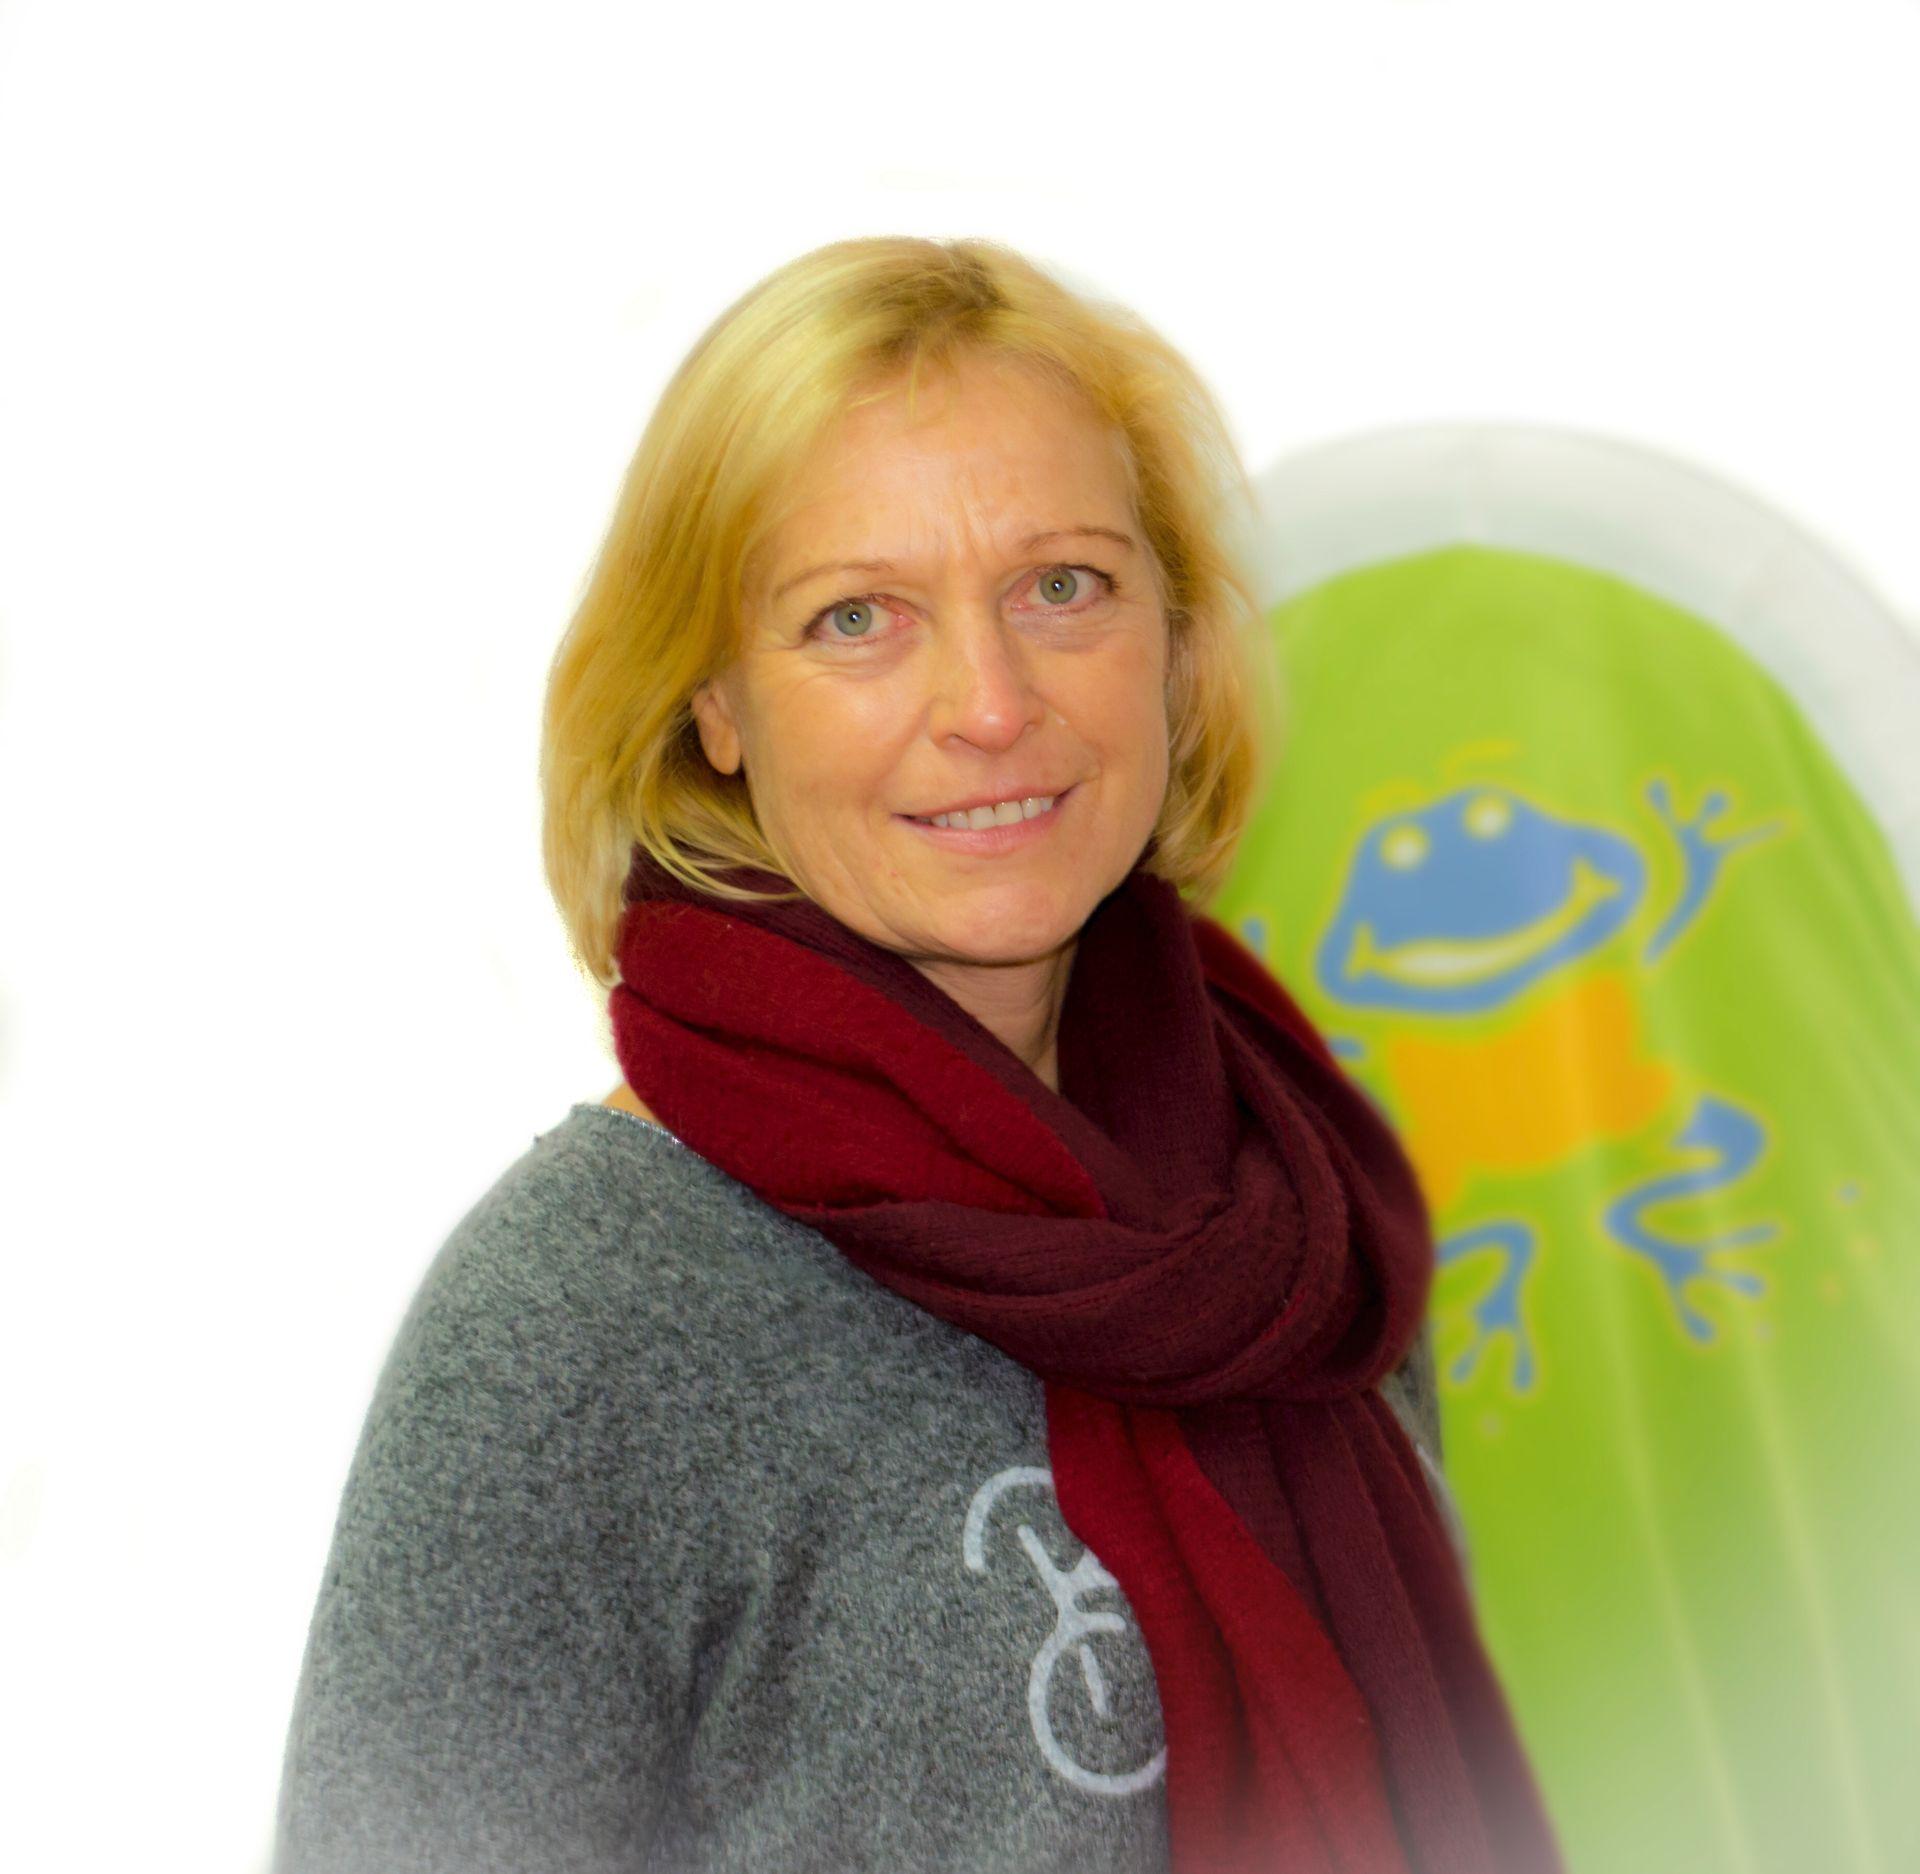 Vorstand | Bürgerbad Handorf - BüBa